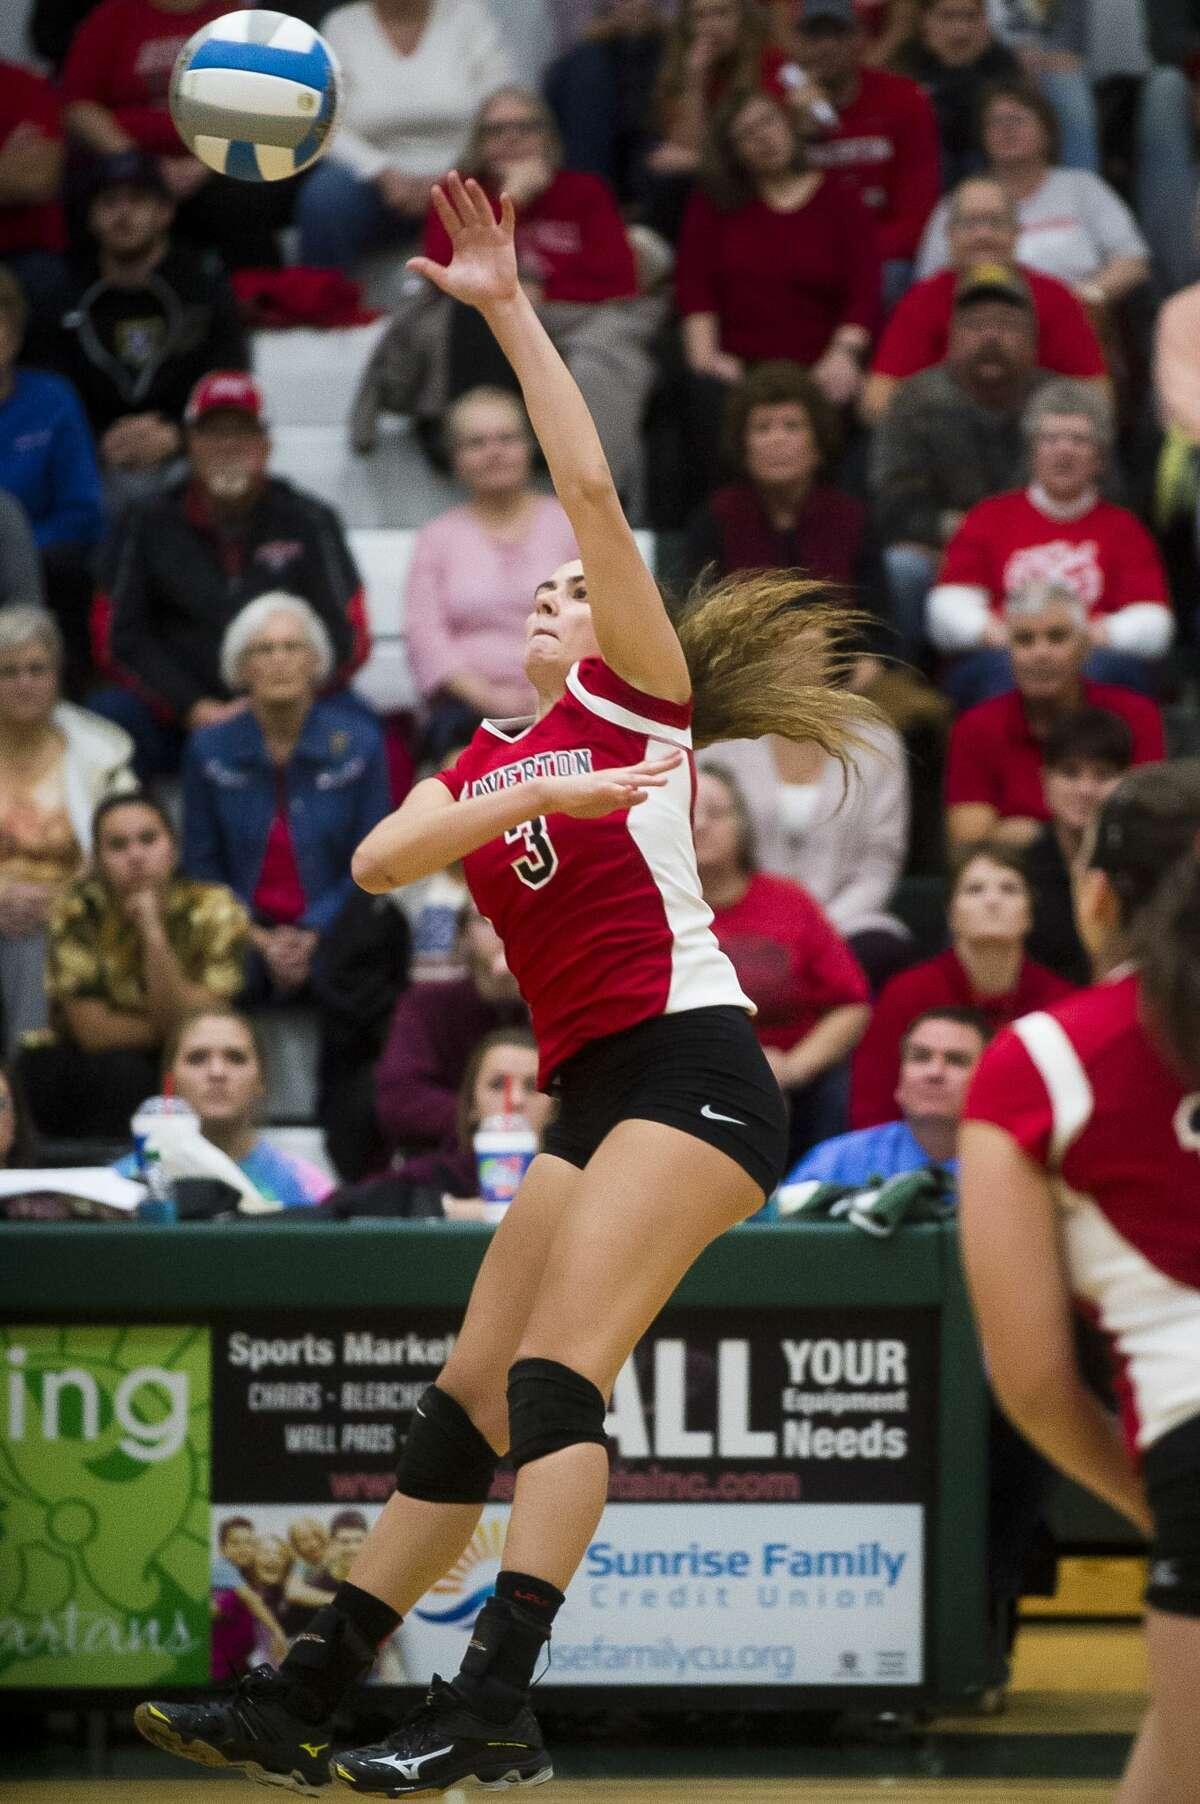 Beaverton senior Reiss Faber spikes the ball during Beaverton's regional final against Ravenna on Tuesday, Nov. 7, 2017 at Pinconning High School. (Katy Kildee/kkildee@mdn.net)